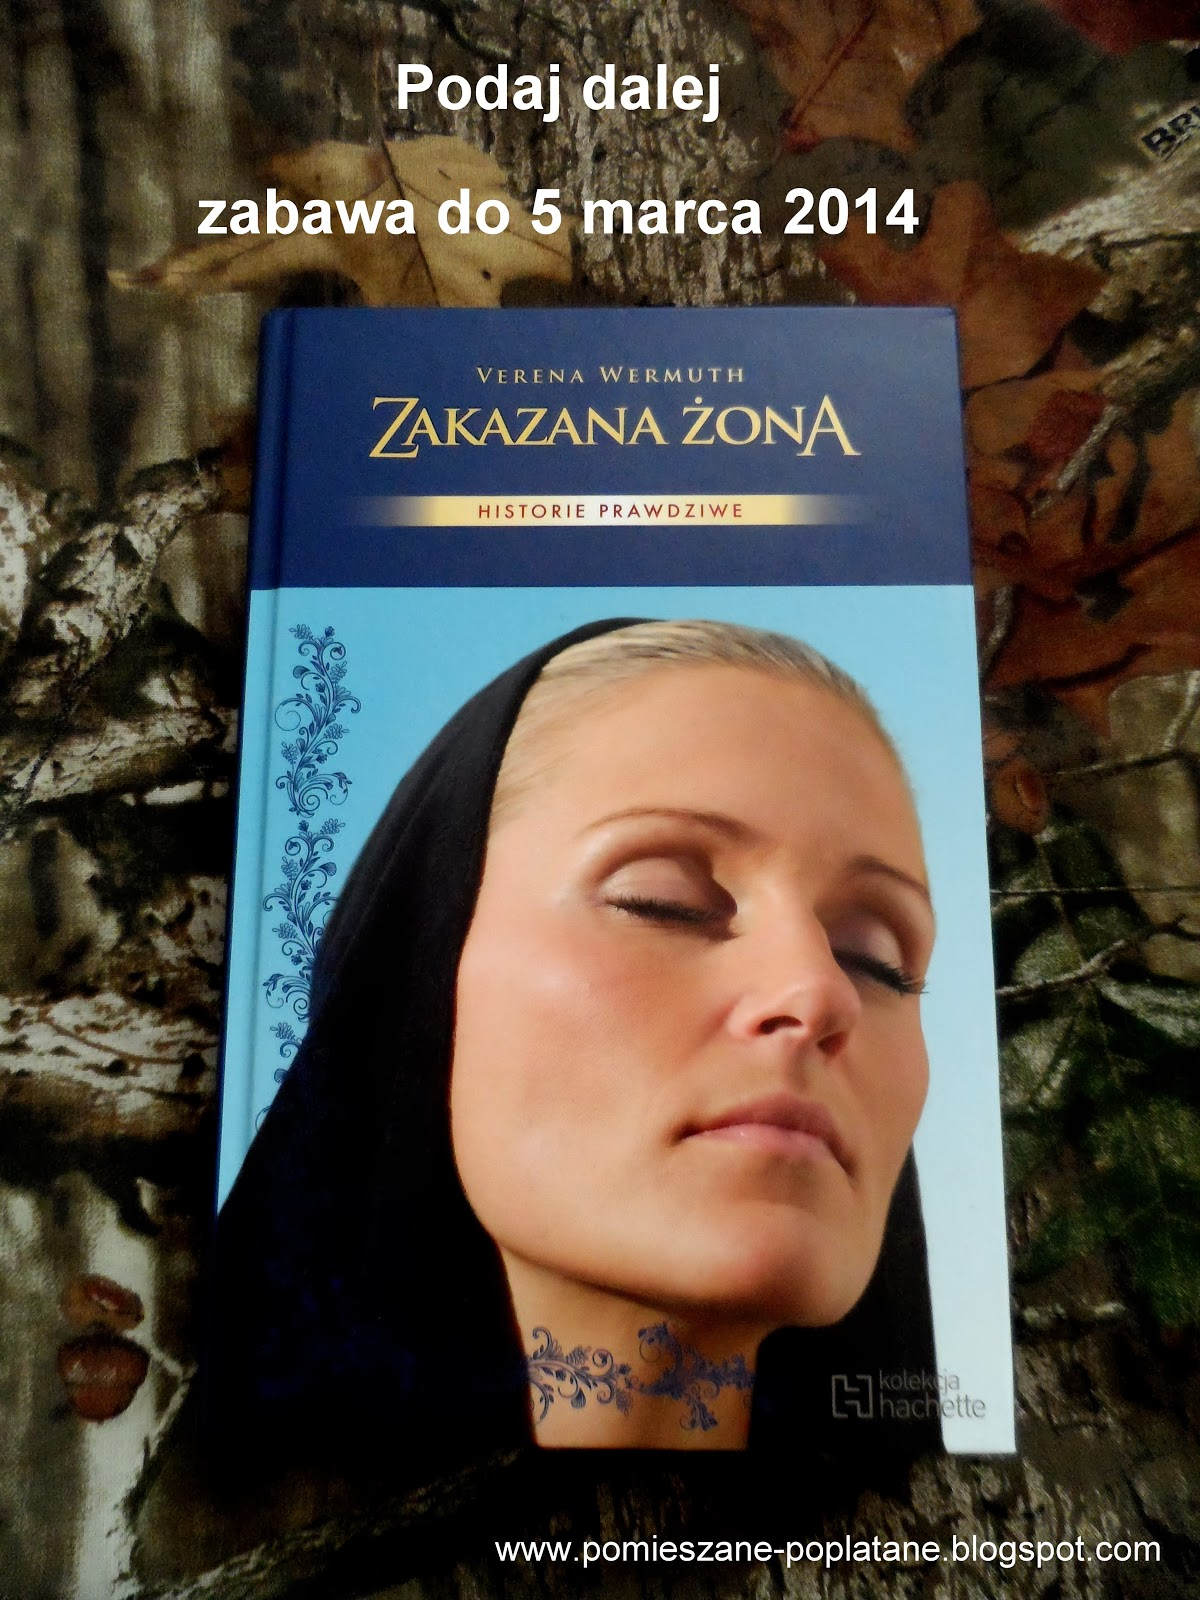 http://pomieszane-poplatane.blogspot.com/2014/02/zabawa-podaj-dalej-z-ksiazka.html?showComment=1393615450788#c2473592743565200757